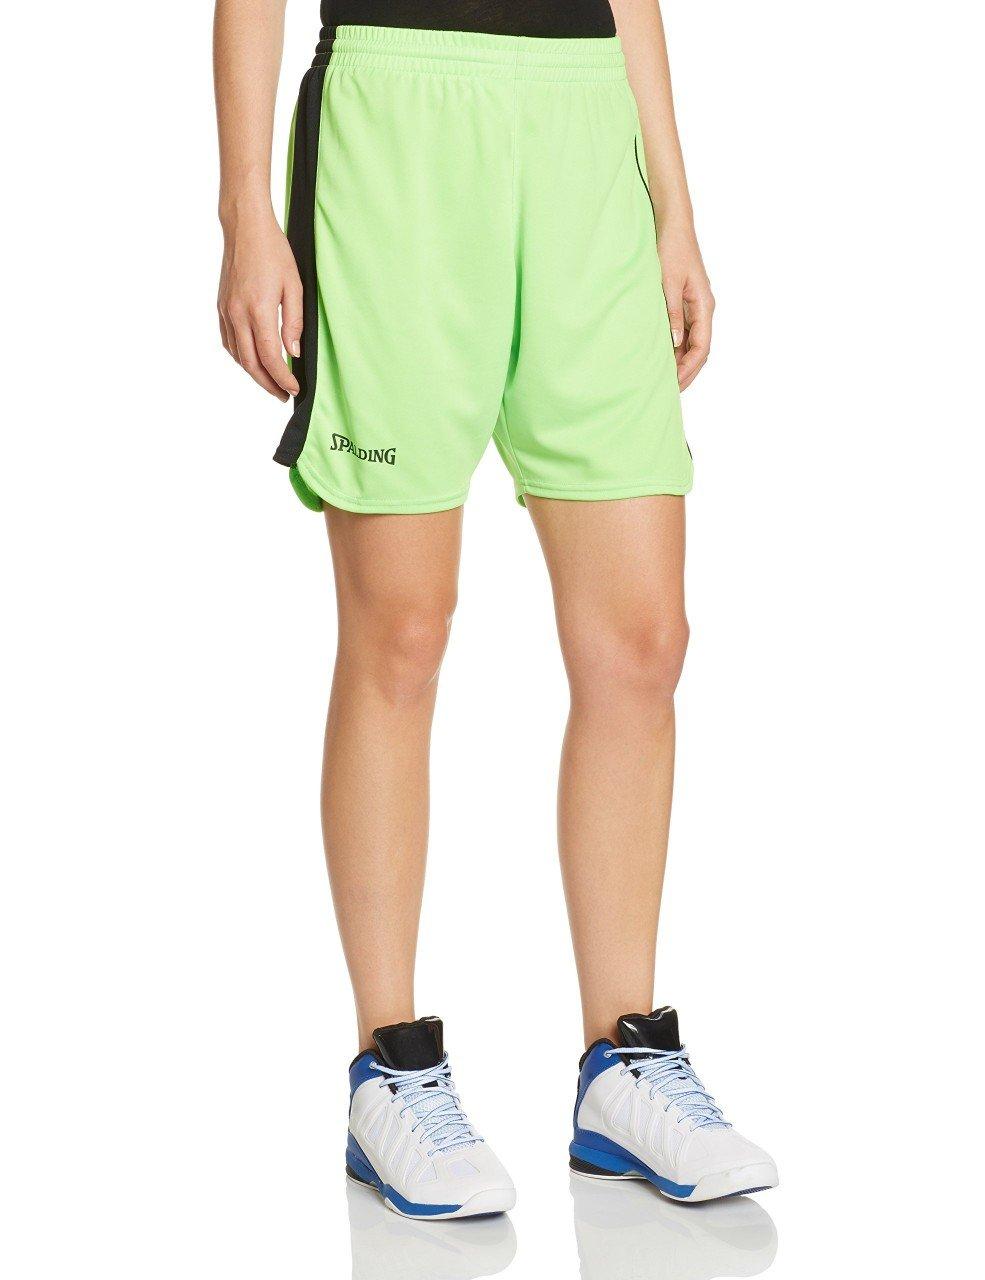 Spalding Teamsport 4her II Women's Shorts 30054110